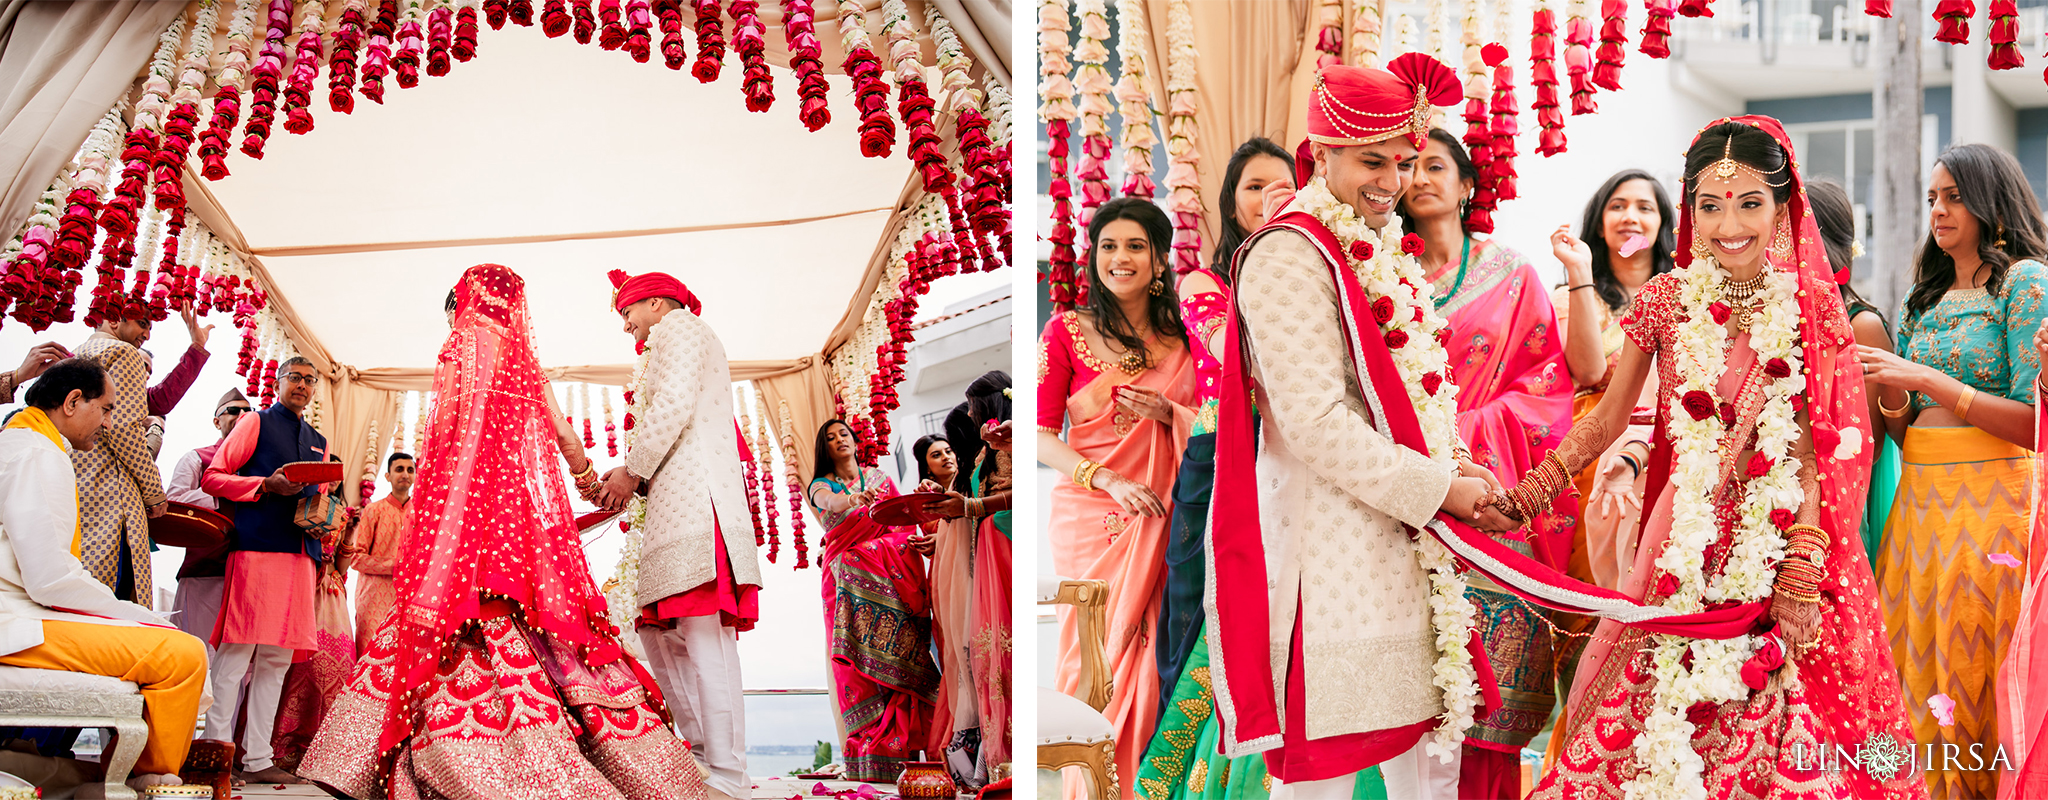 24 Loews Coronado Bay Resort San Diego Indian Wedding Photography